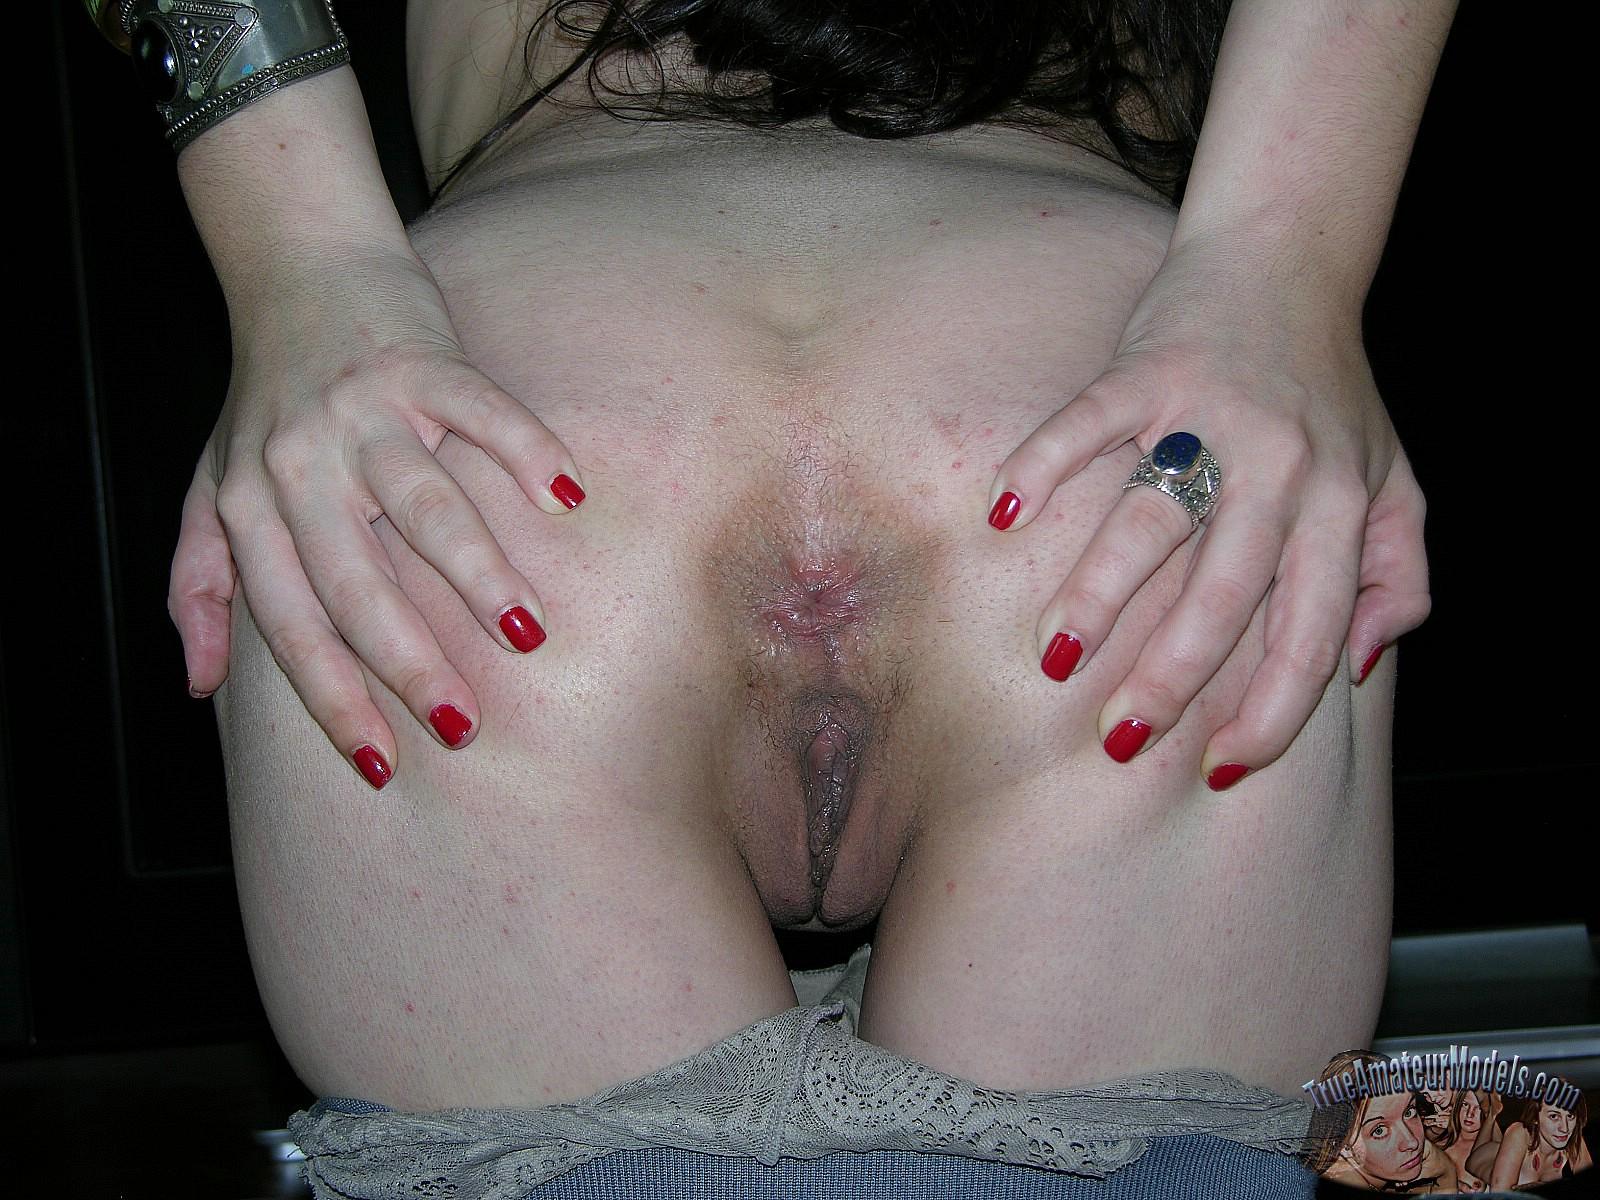 Naked milfs erotica